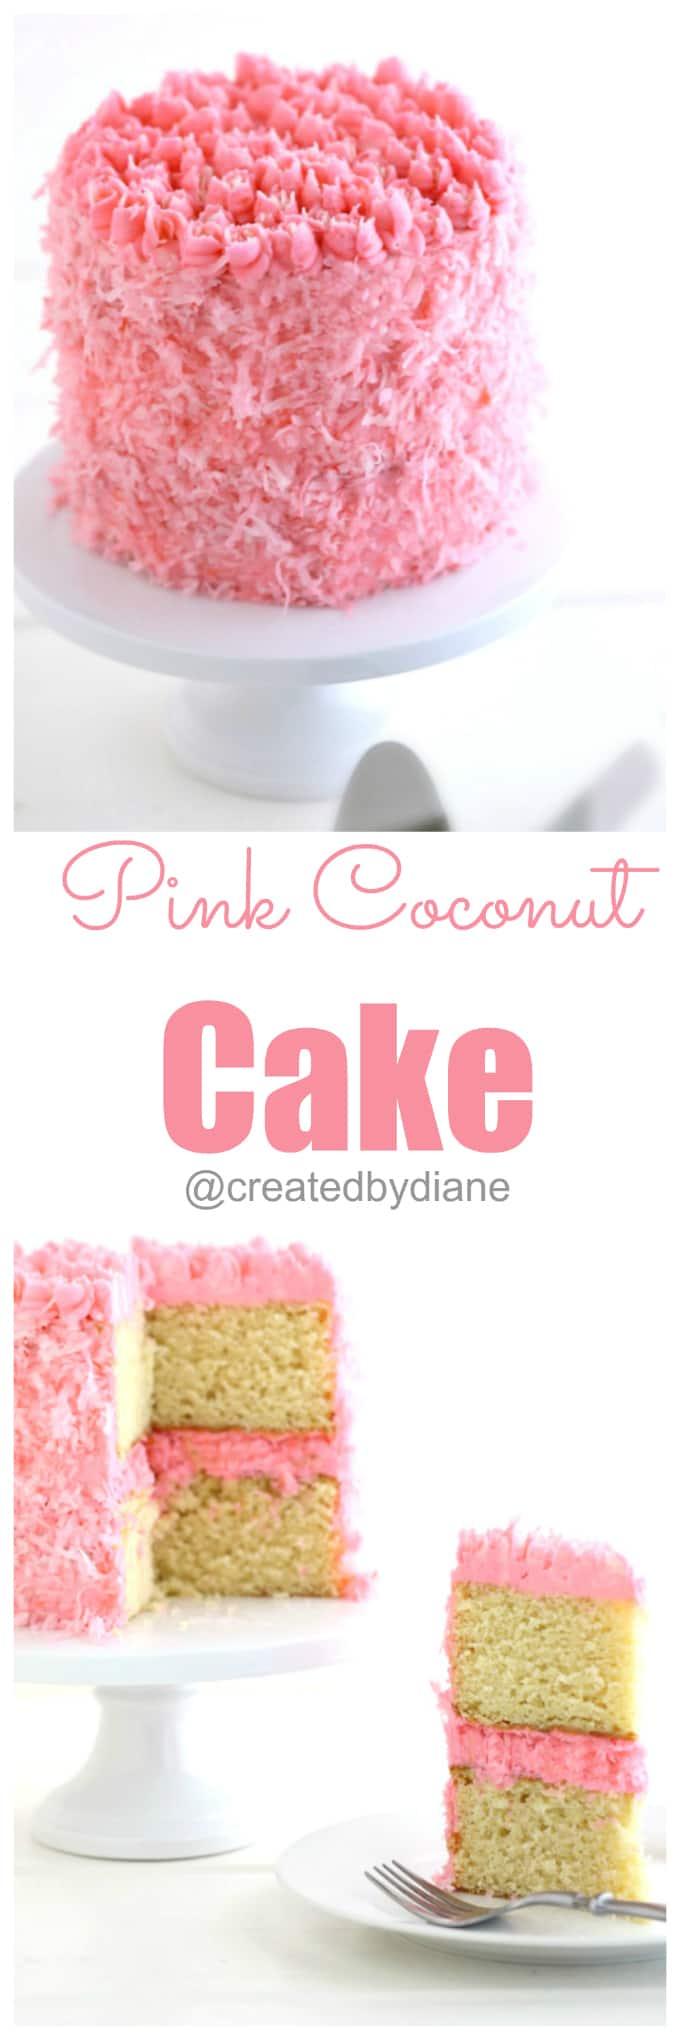 pink coconut cake recipe @createdbydiane